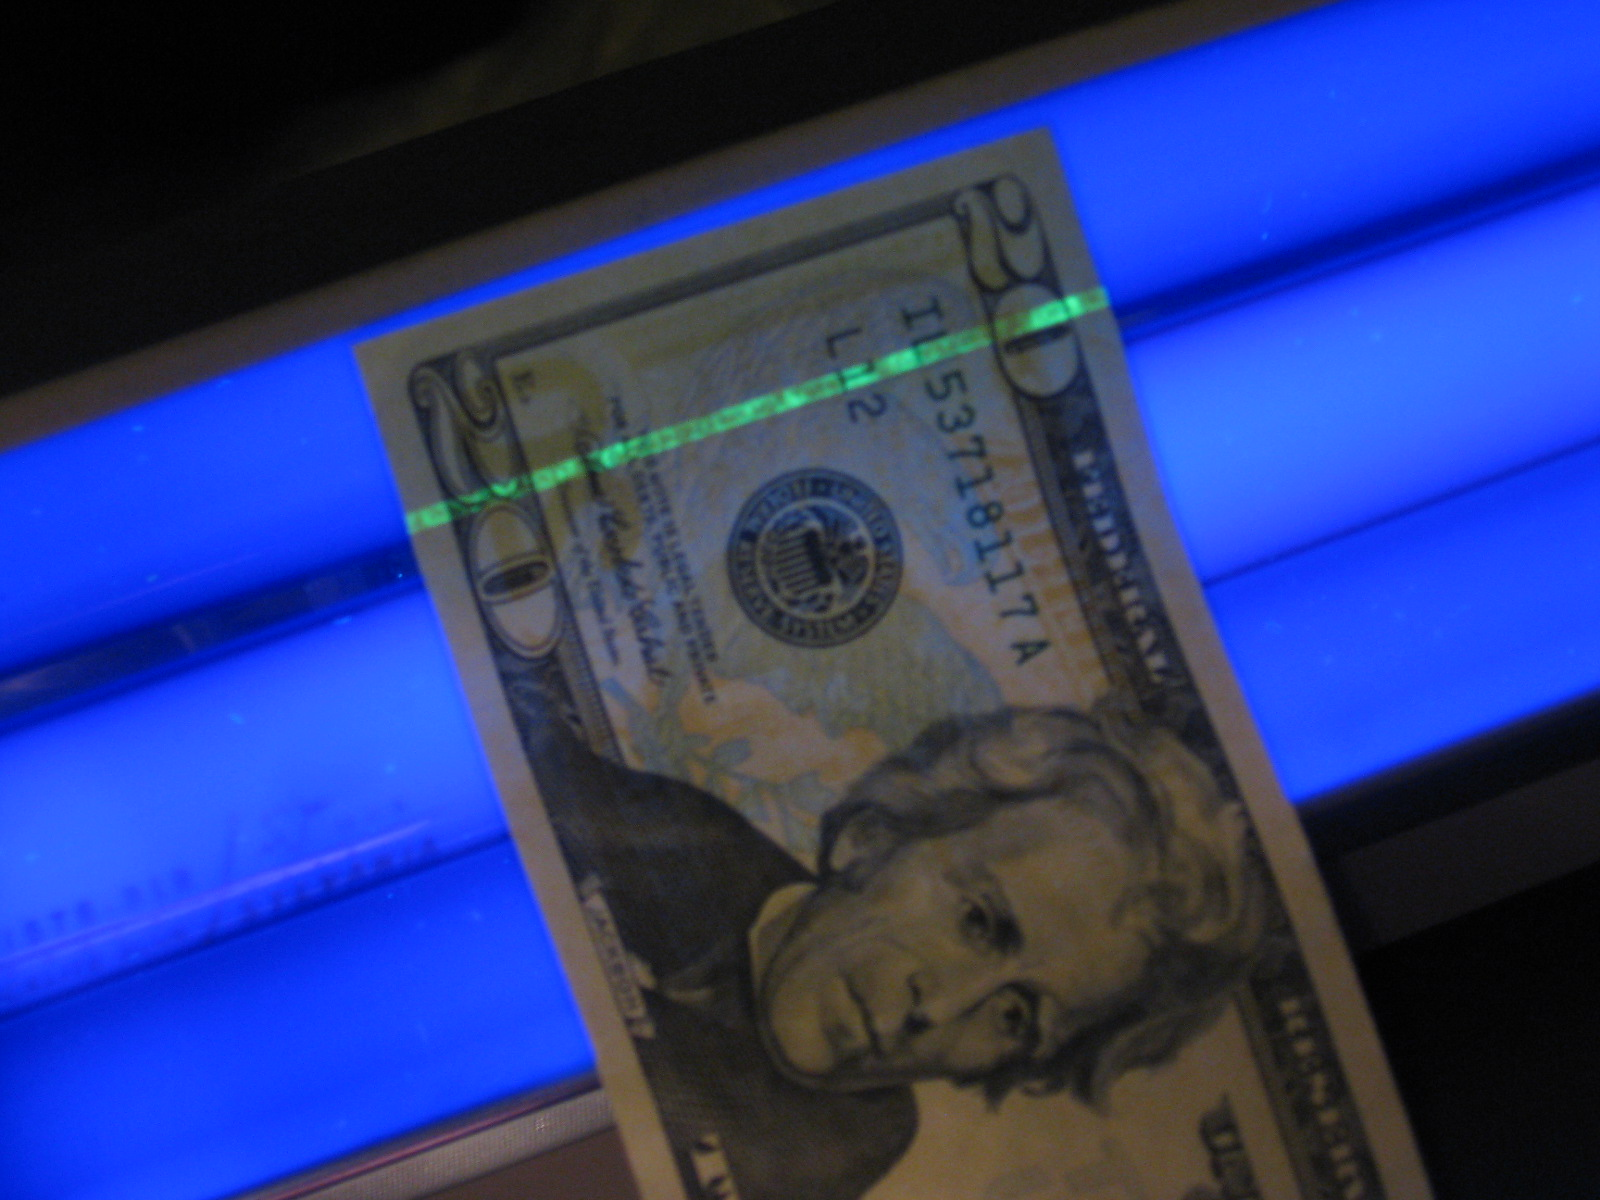 File:US $20 under blacklight jpg - Wikimedia Commons